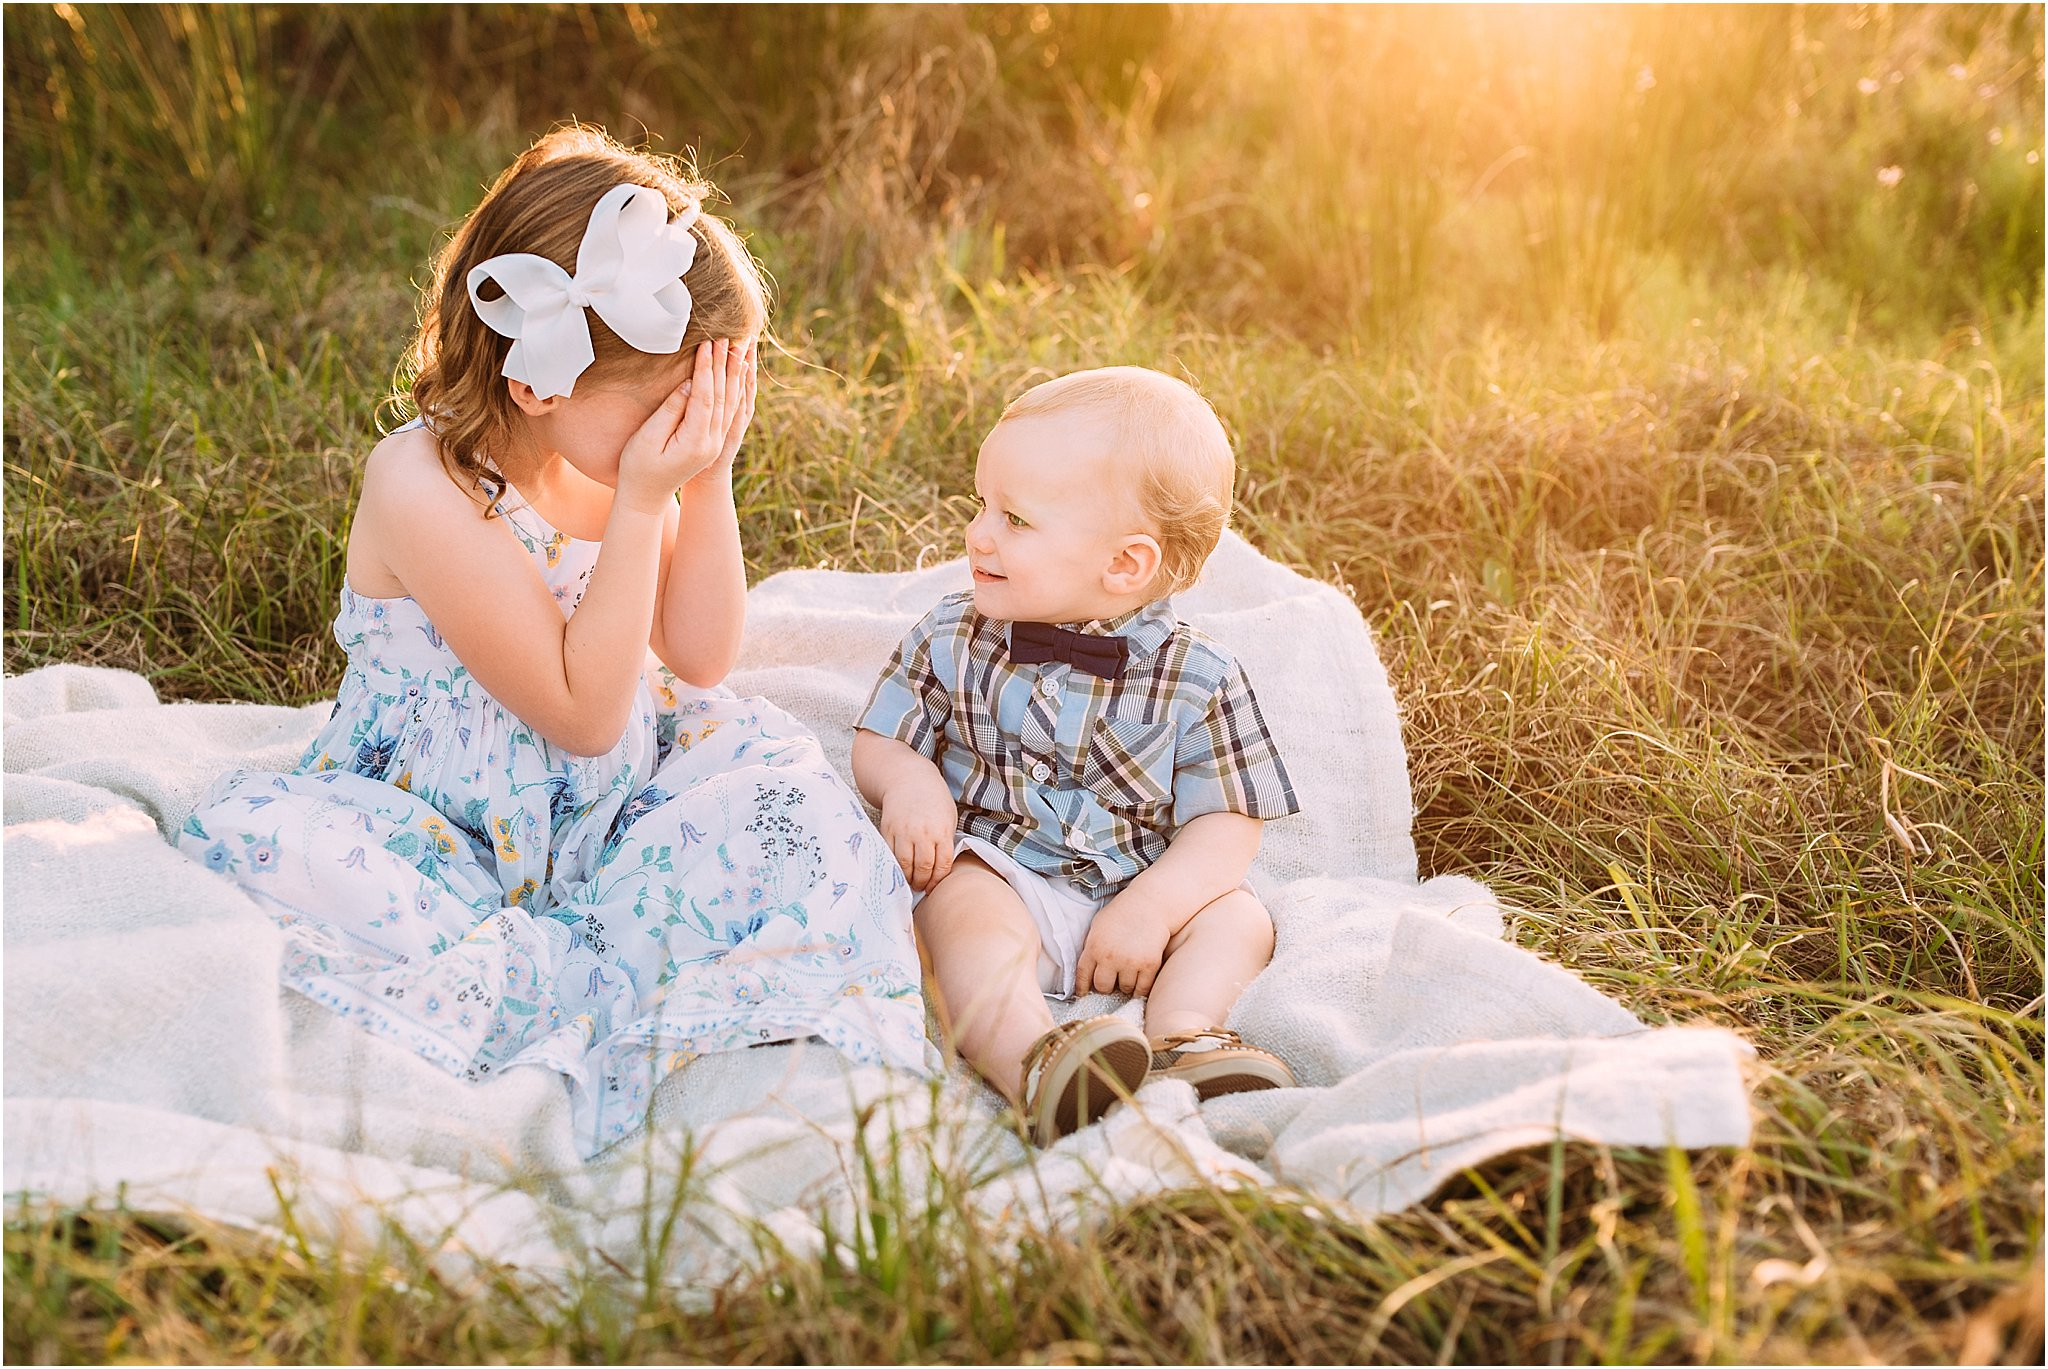 Ashley_Rogers_Photography_Orlando_Non-Posed_Newborn_Family_Lifestyle_Photographer_0384.jpg